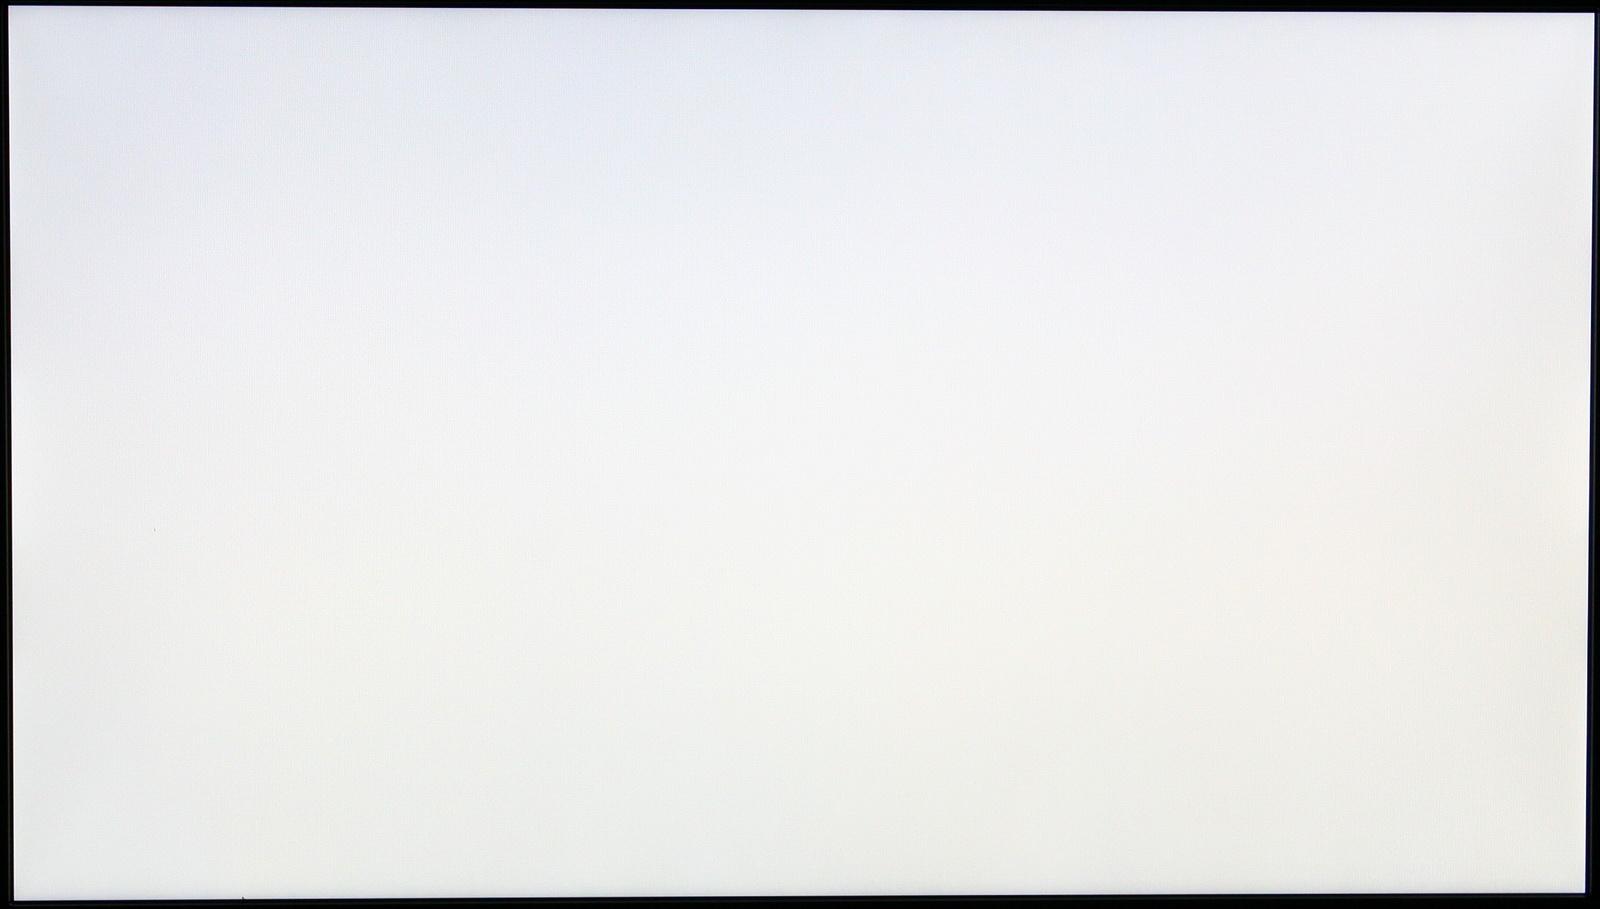 ppt 背景 背景图片 边框 模板 设计 相框 1600_909